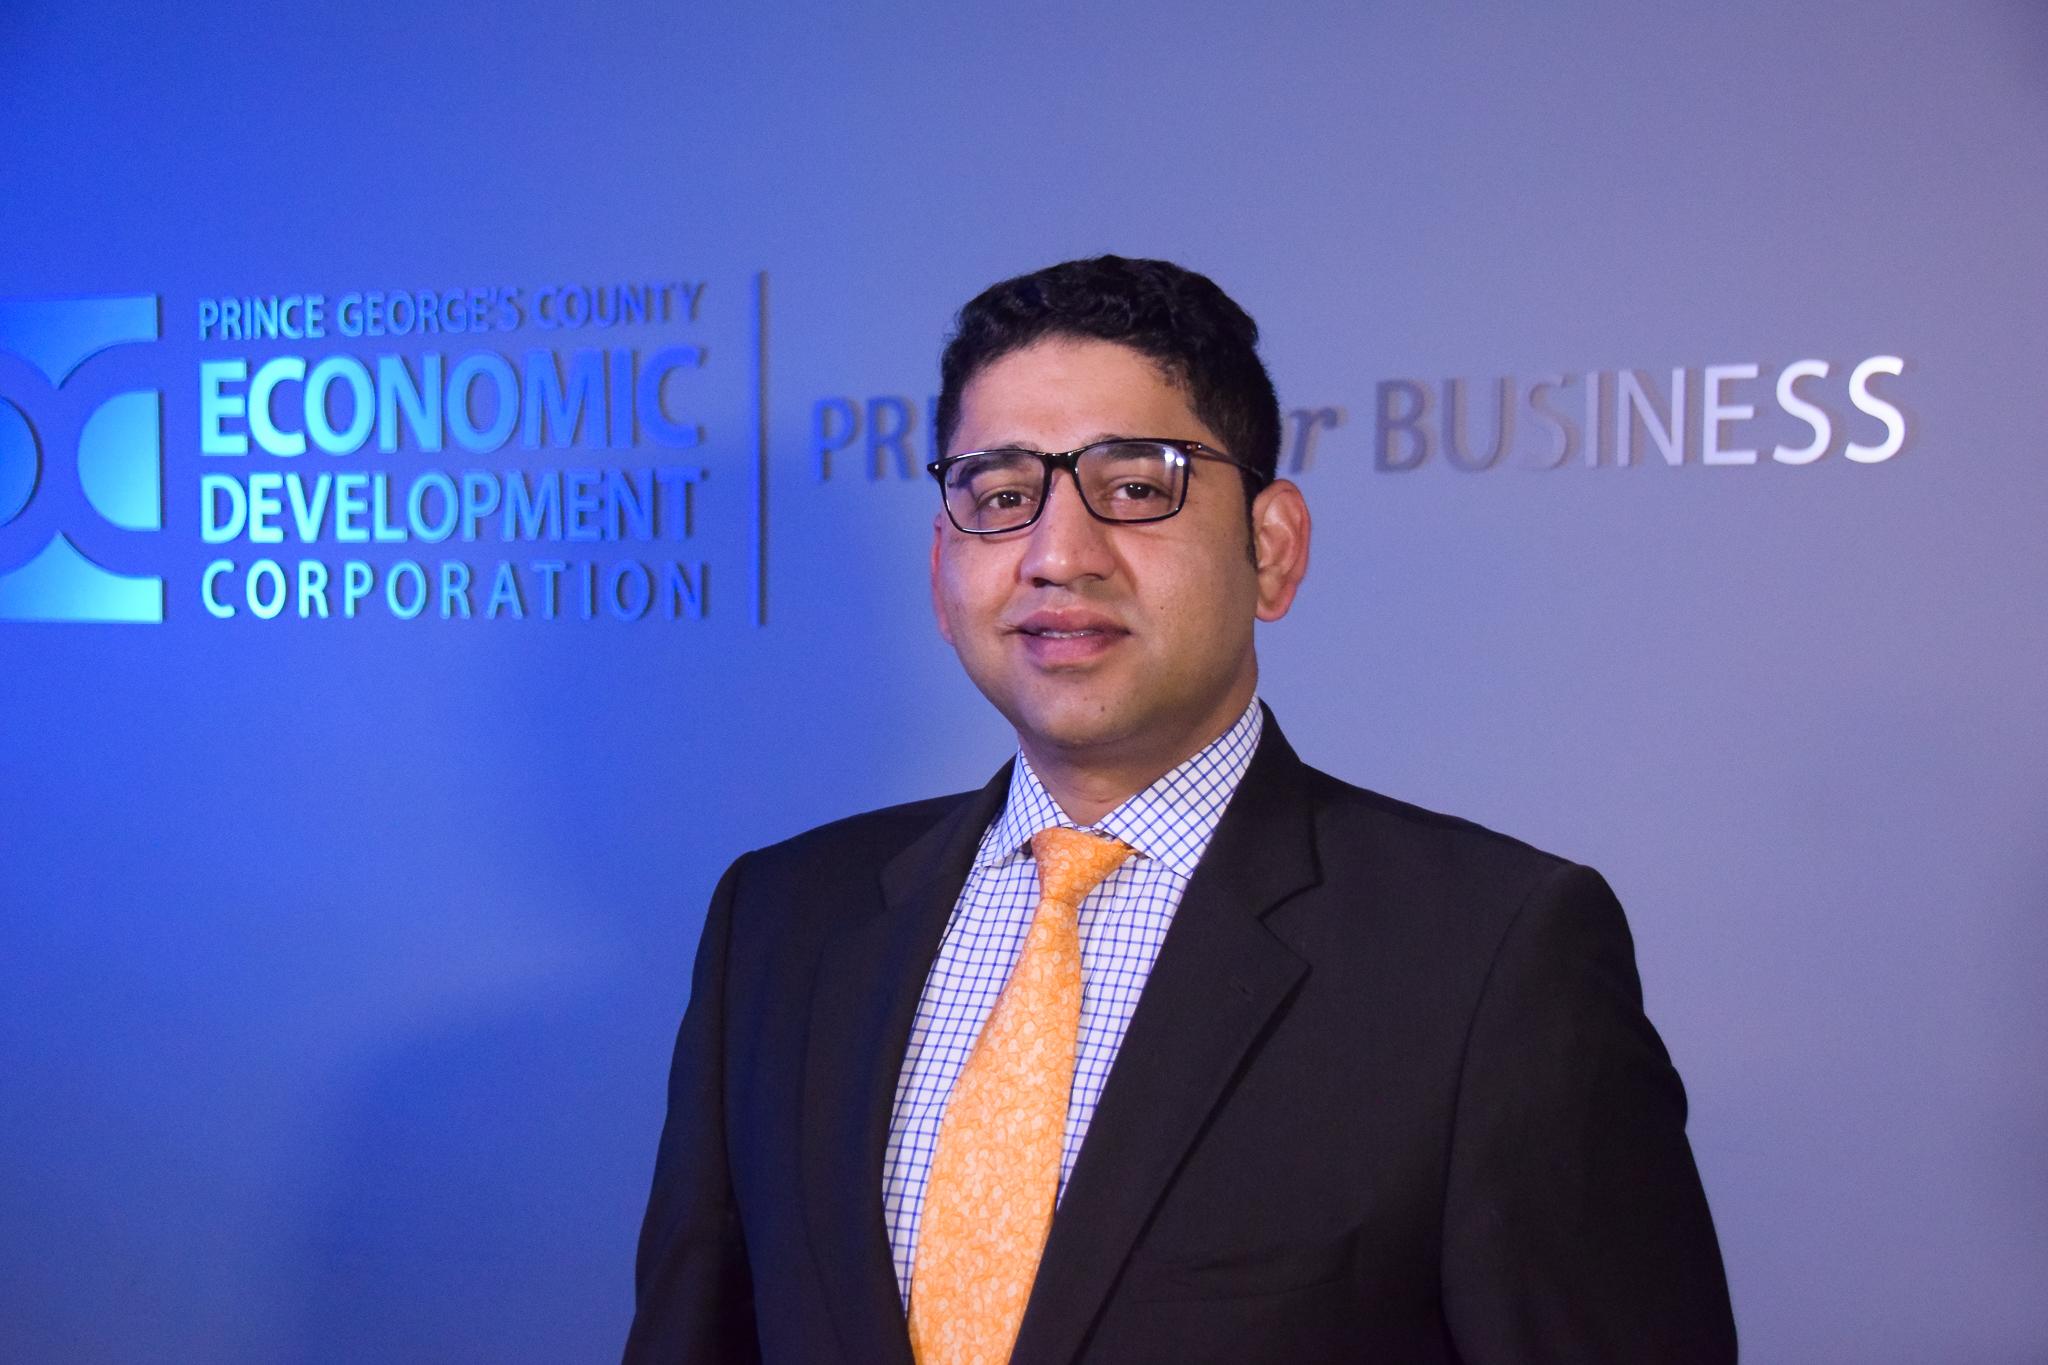 Mayank Kapur - Director of Economic Development301-583-4632